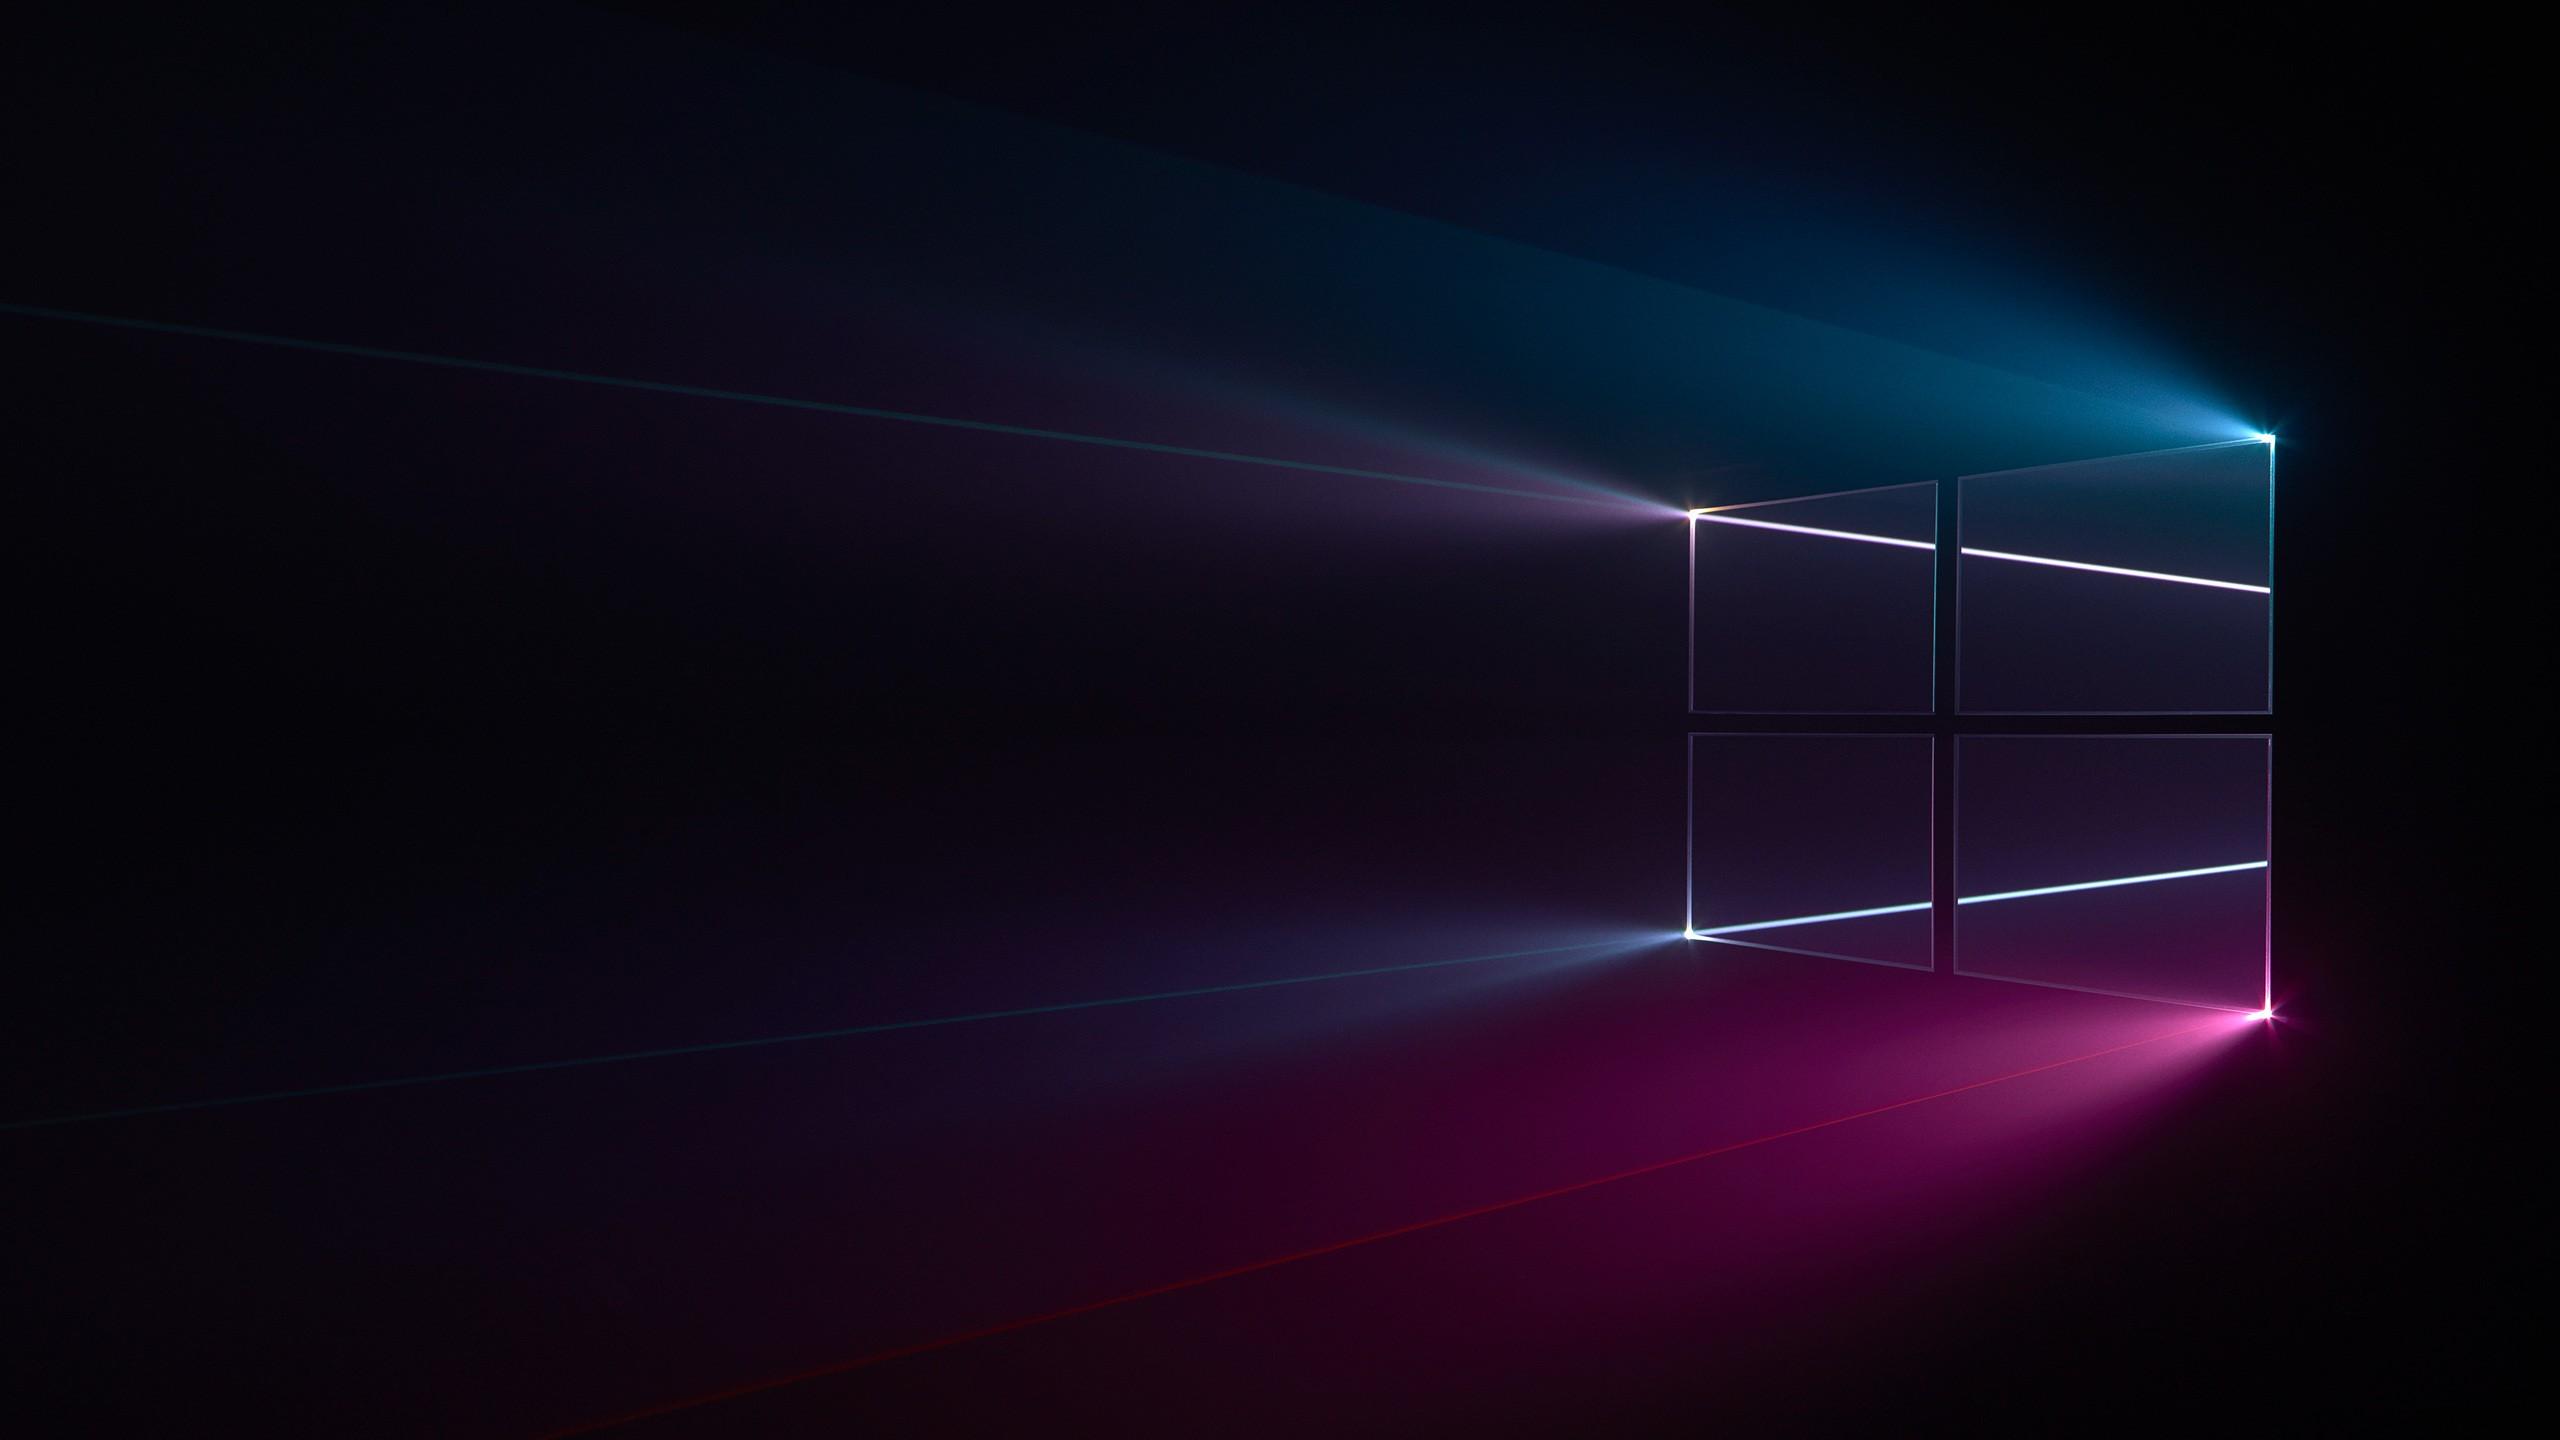 Wallpaper 1920x1080 Windows 10